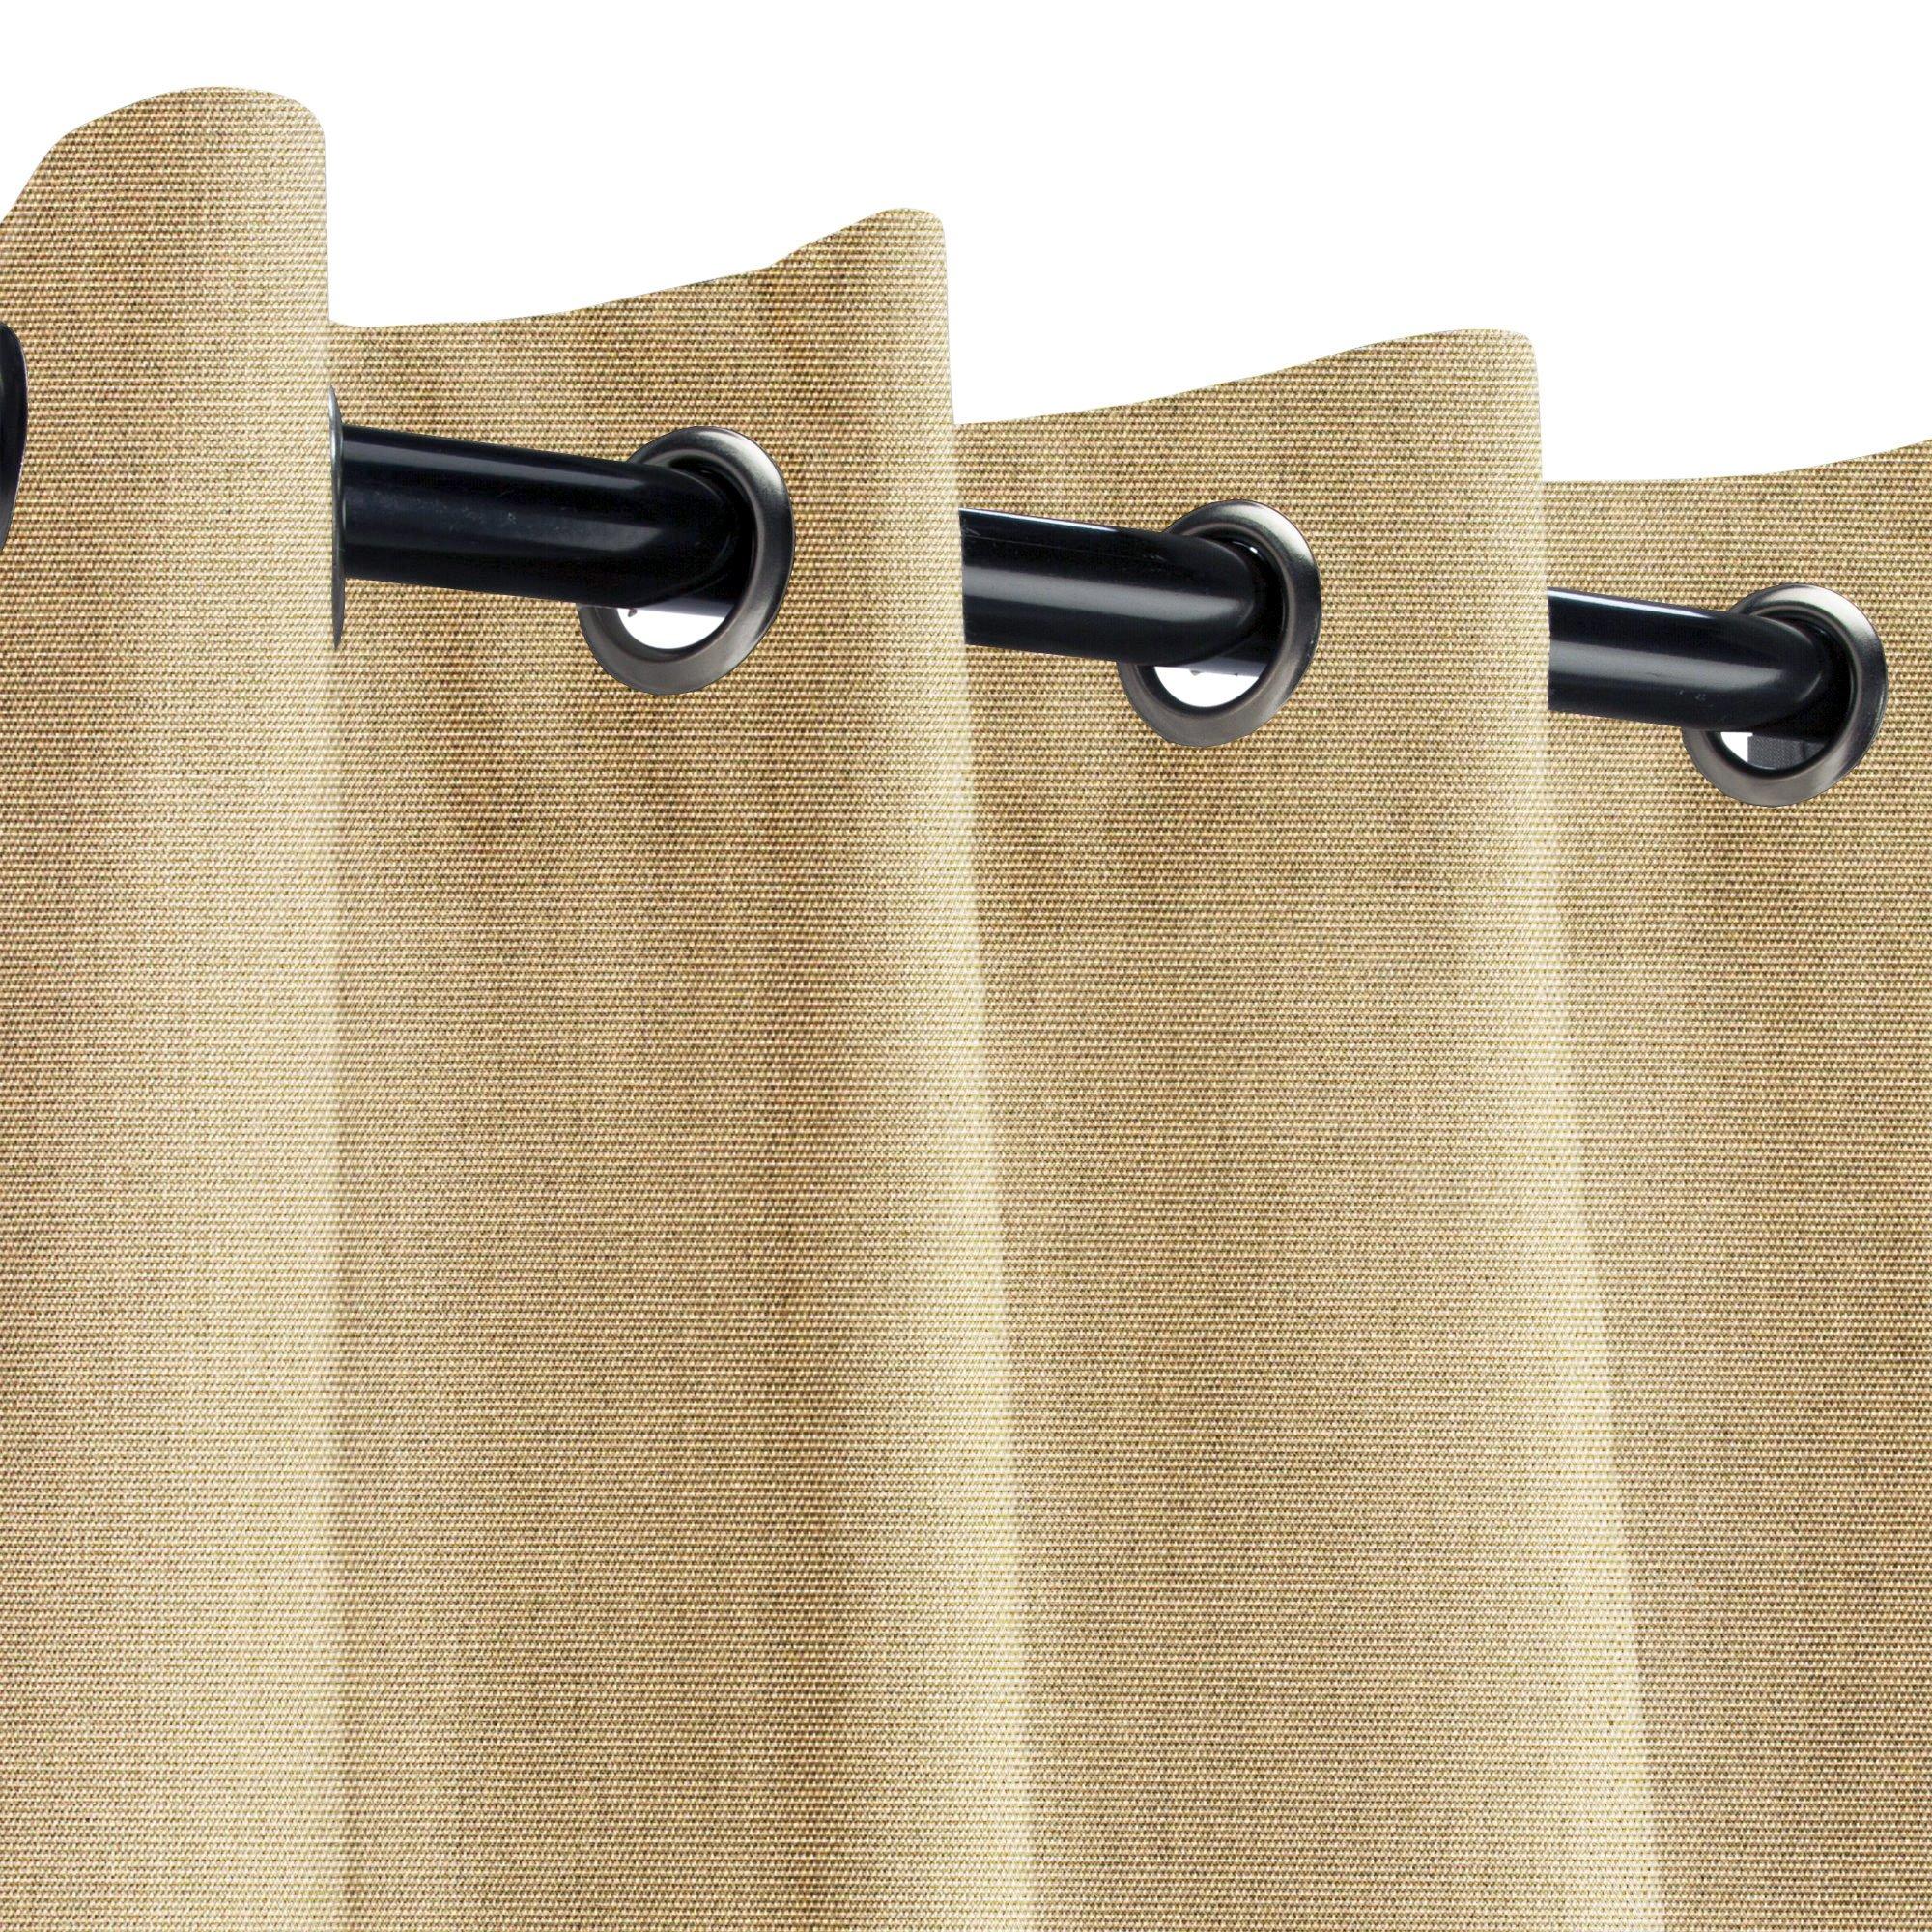 Sunbrella Canvas Heather Beige Outdoor Curtain with Nickel Grommets 50 in. Wide x 108 in. Long